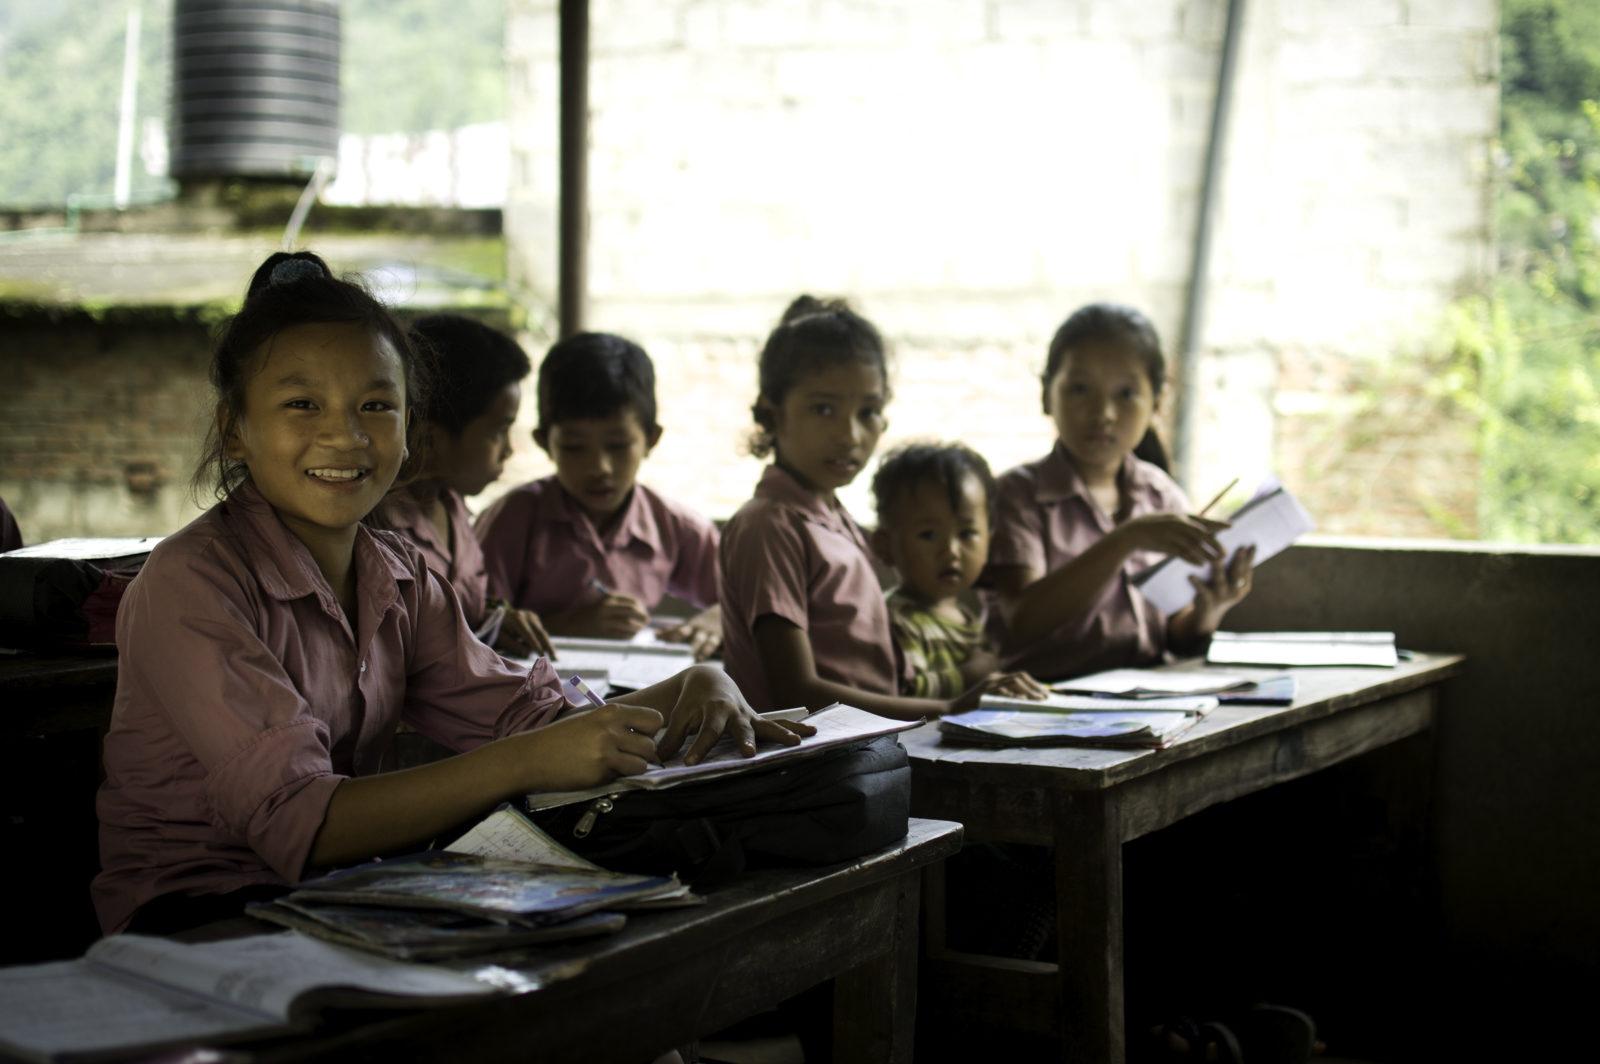 Nepal istruzione 10